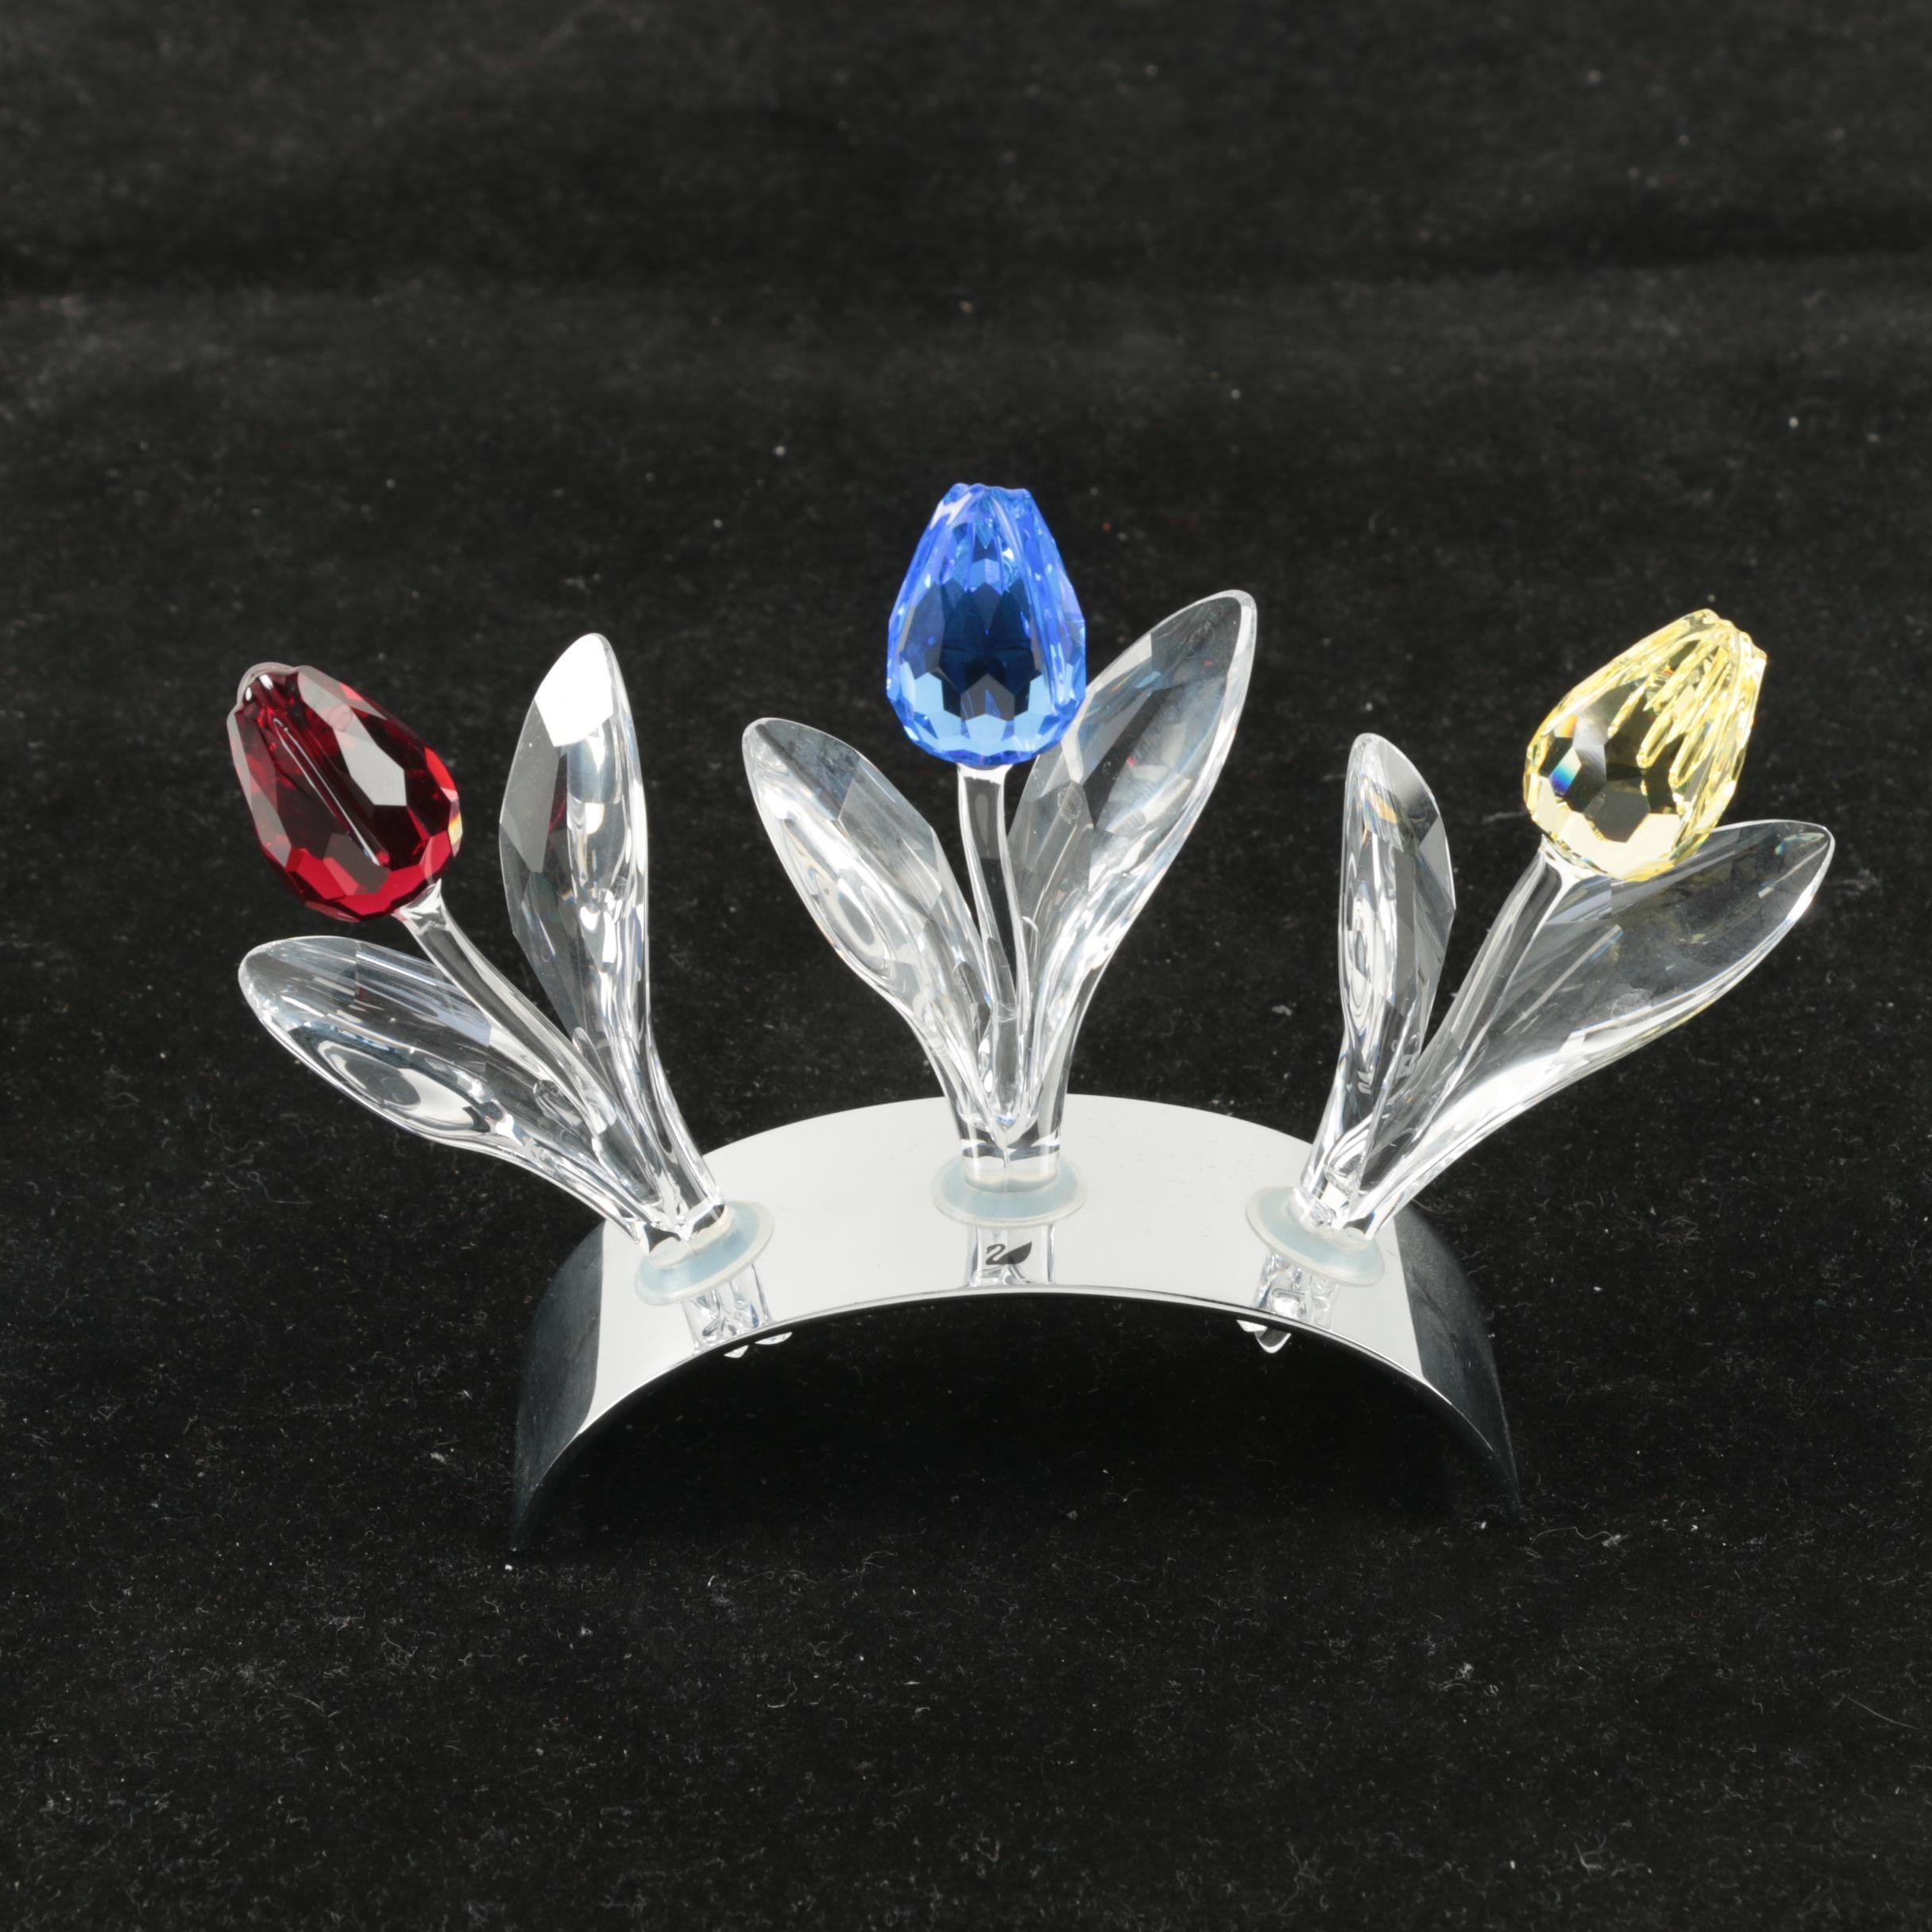 Swarovski Crystal Flower Display in Original Box